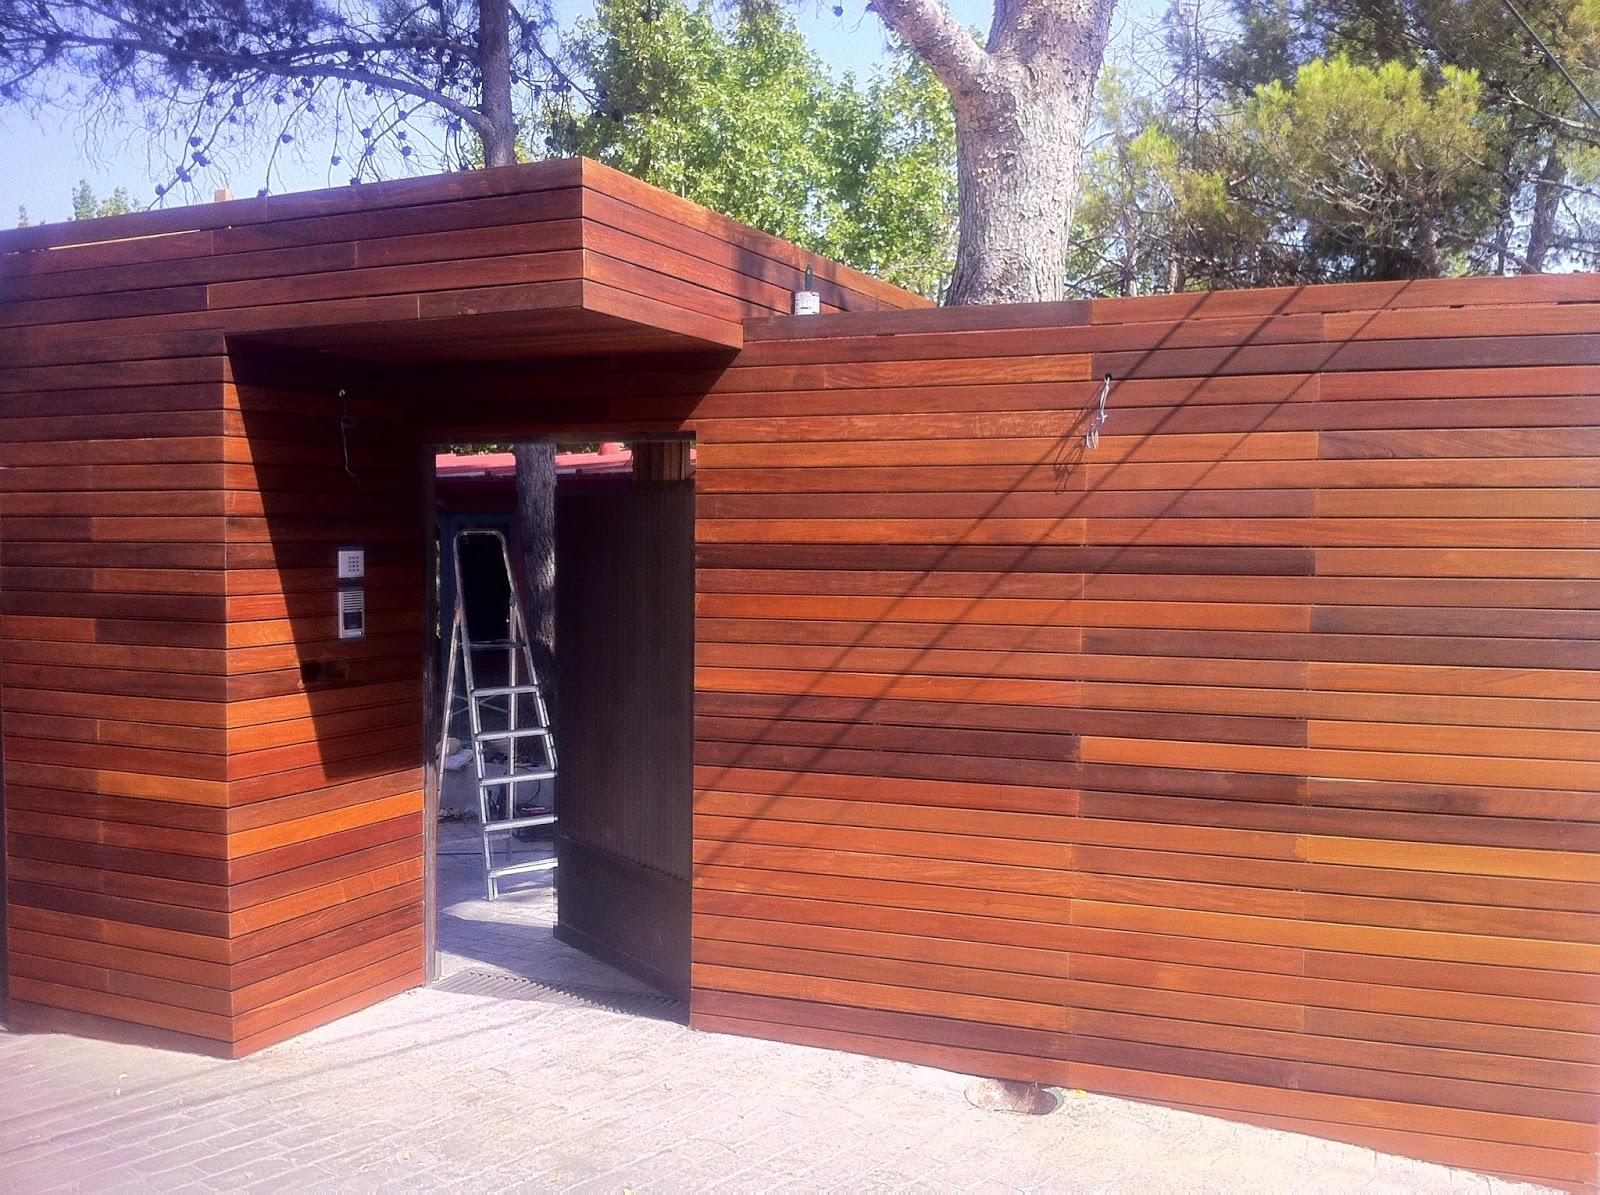 Tarimas de exterior ipe top madera suelos de tarima - Ipe madera exterior ...